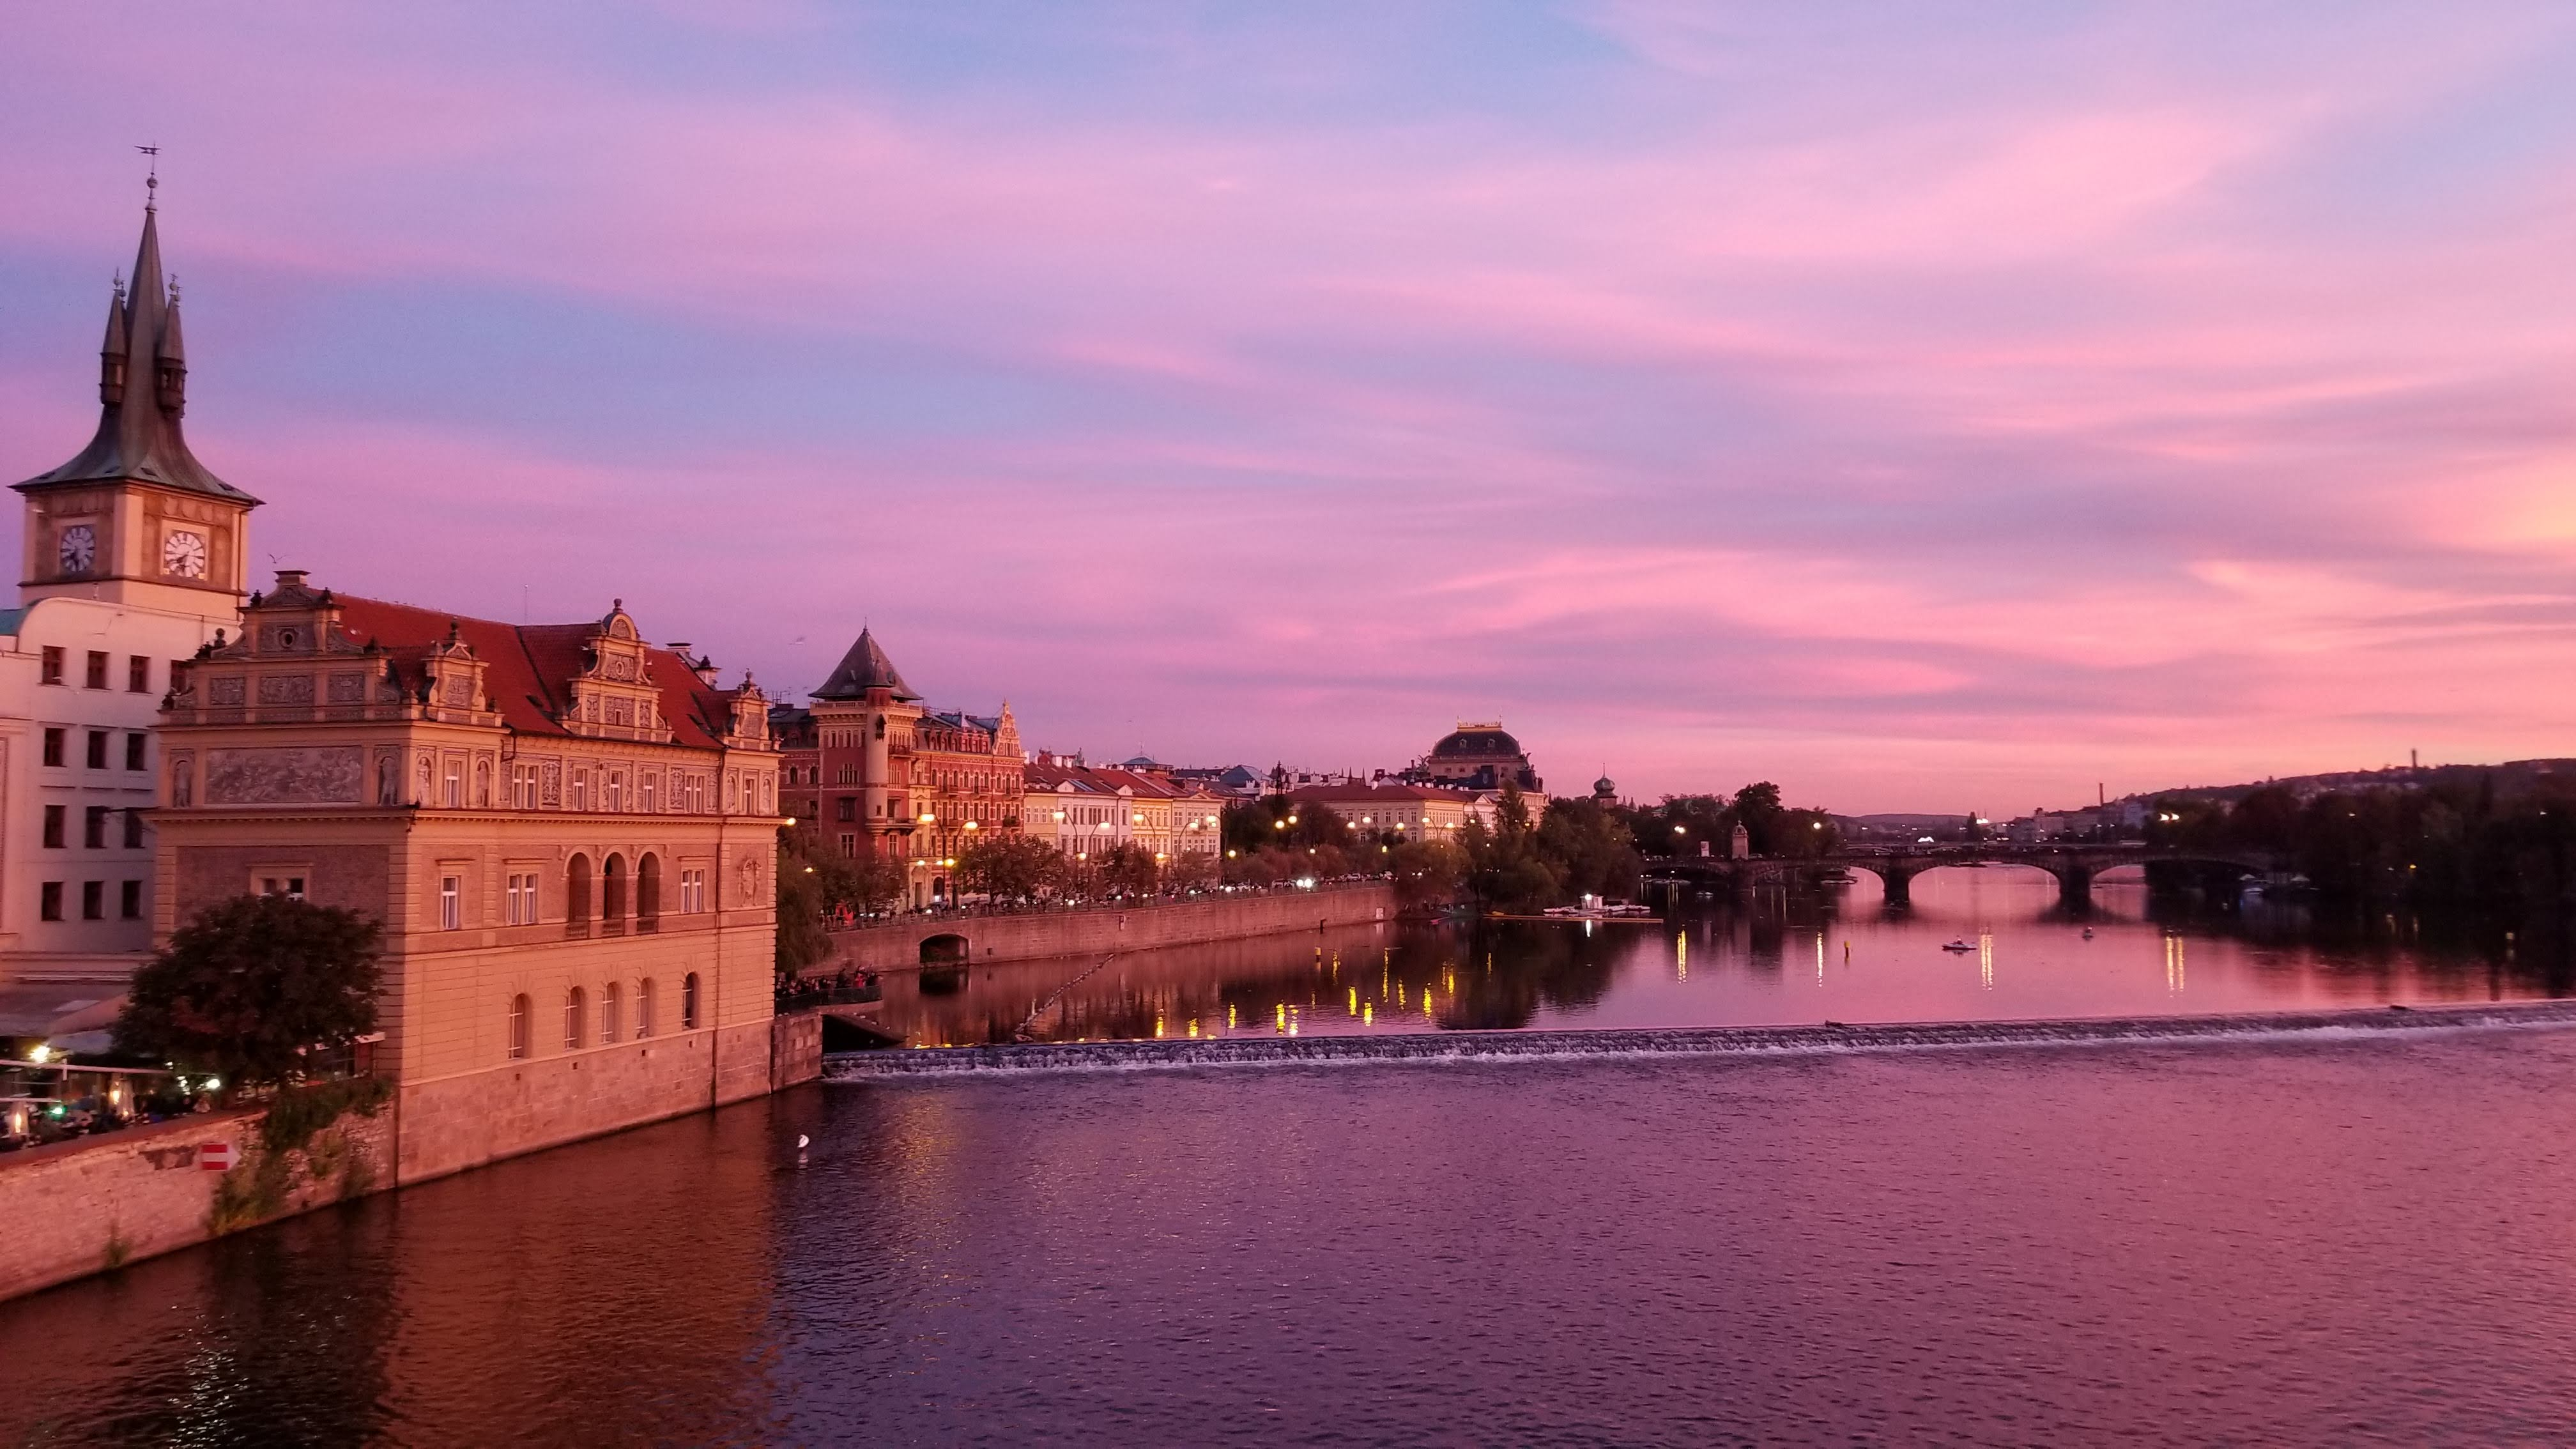 Sunset at Charles Bridge by K. Rice